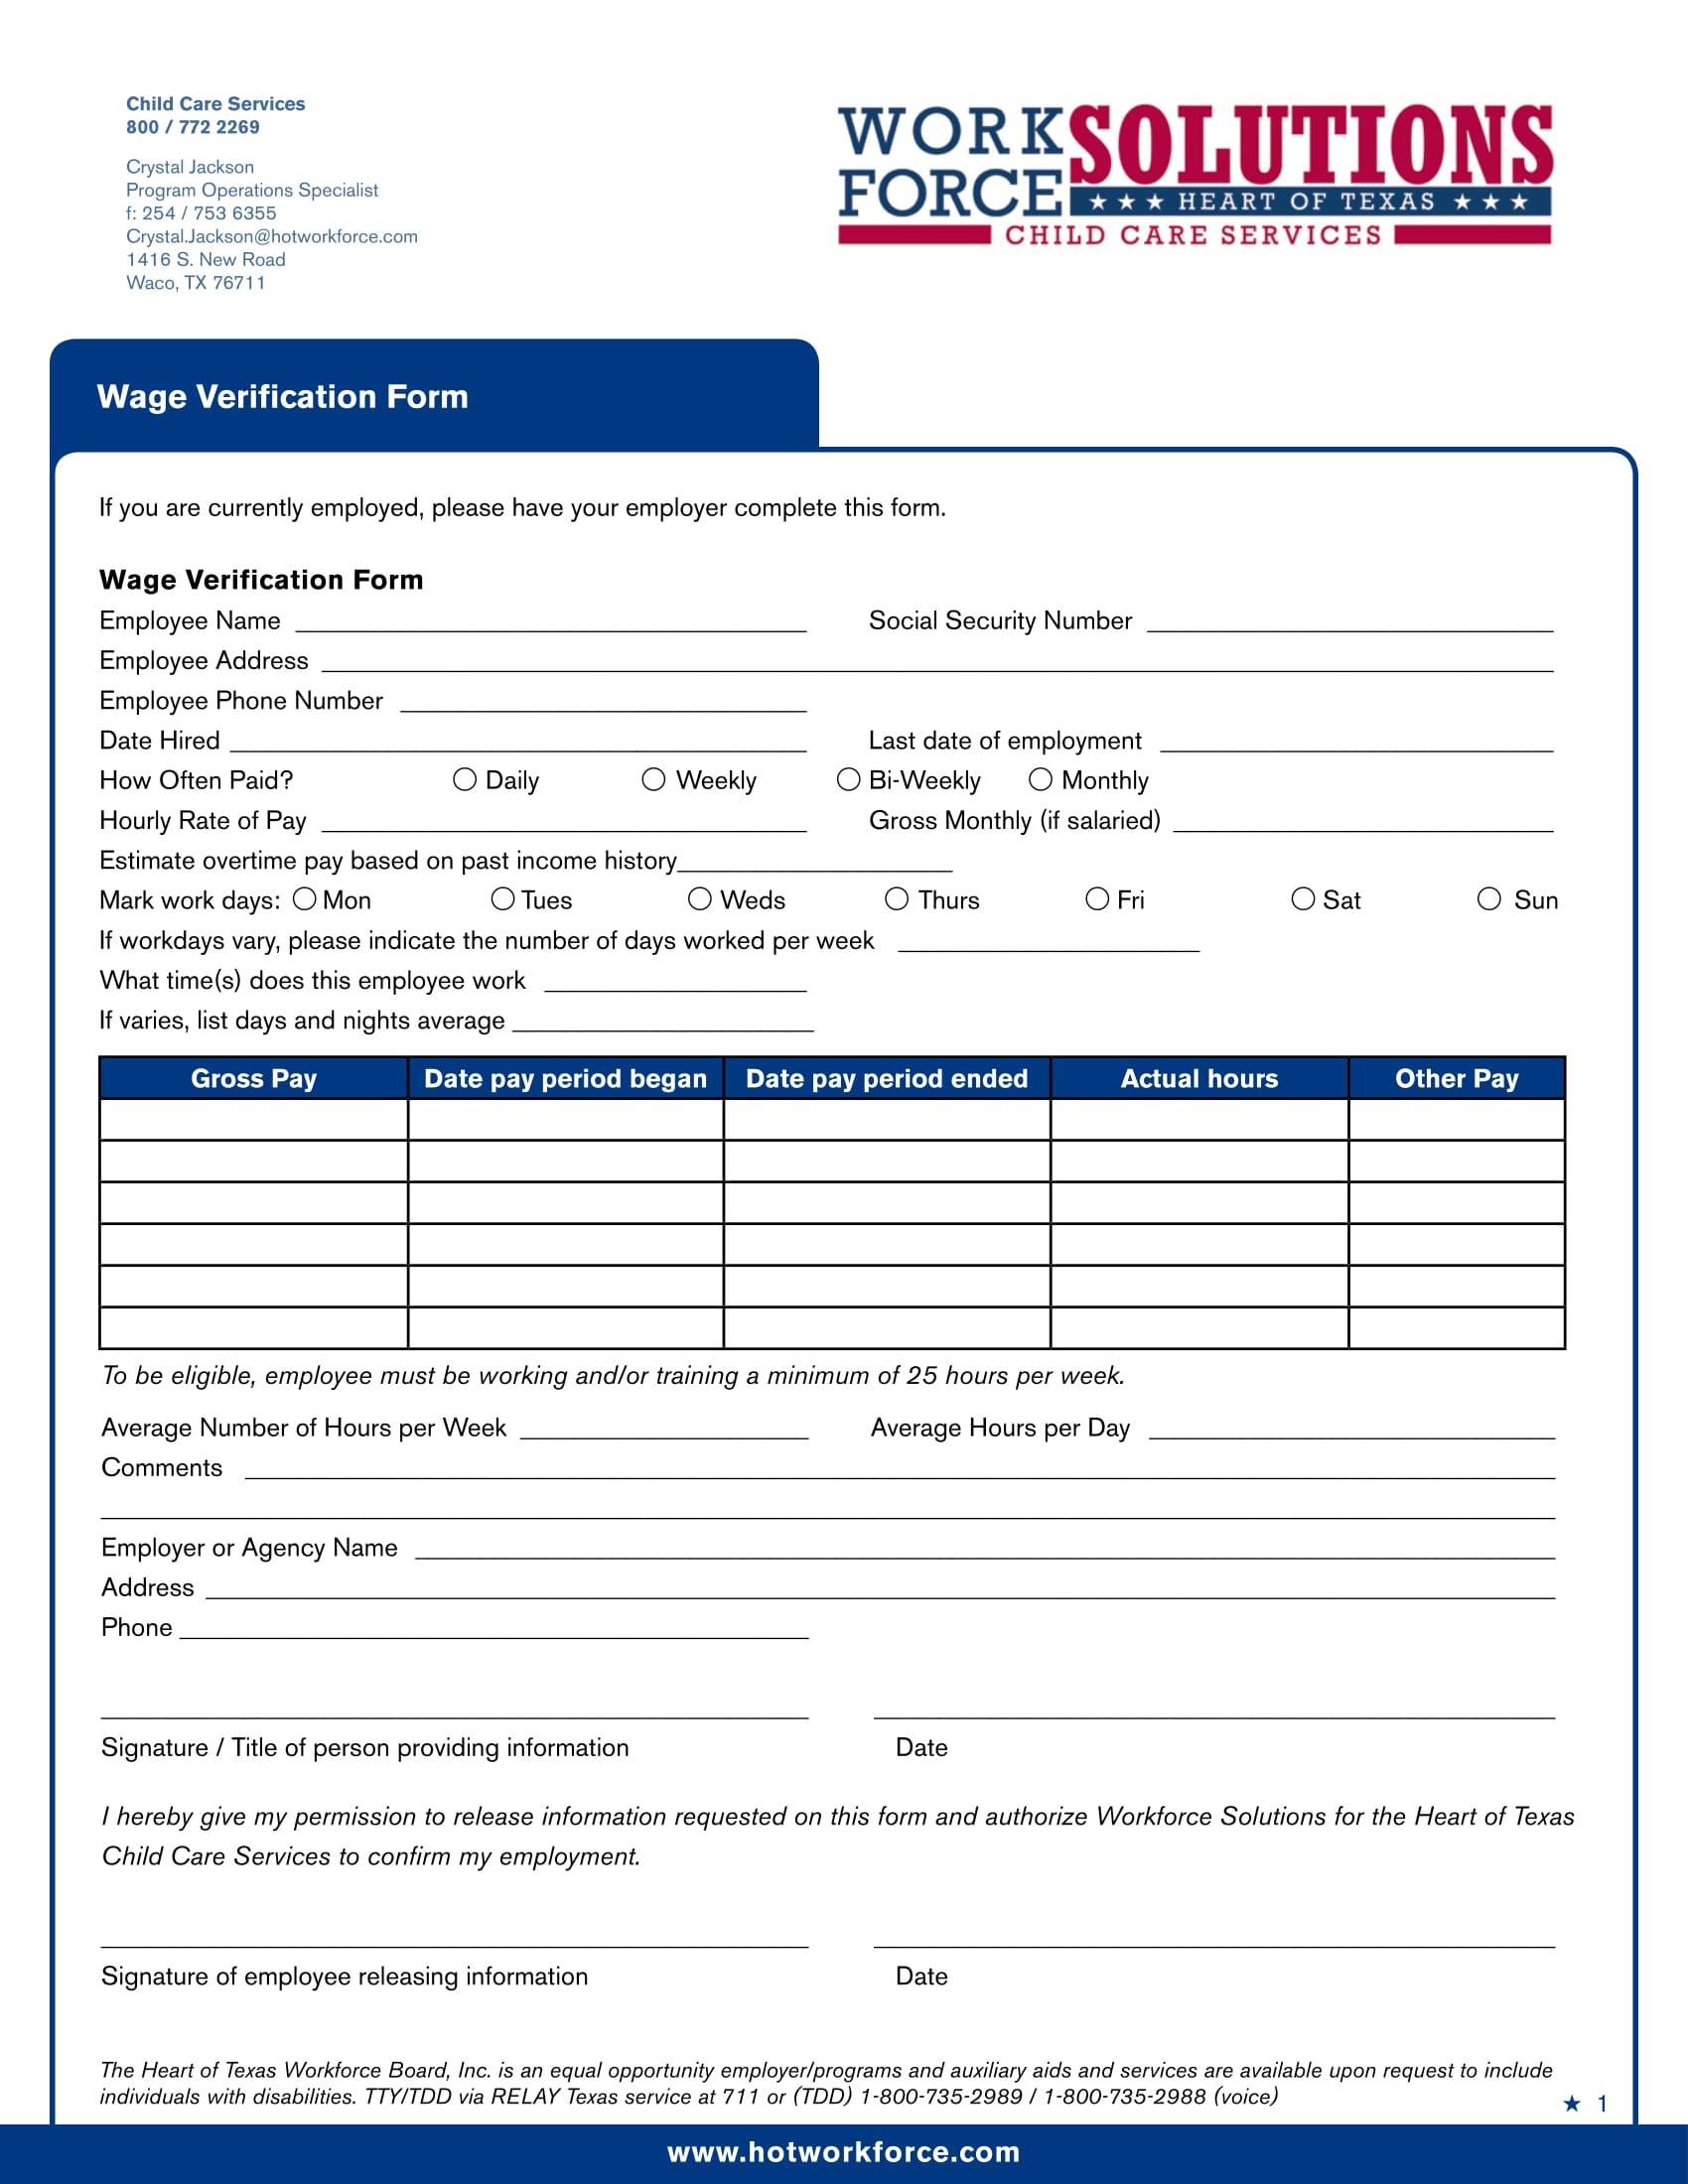 workforce wage verification form 1